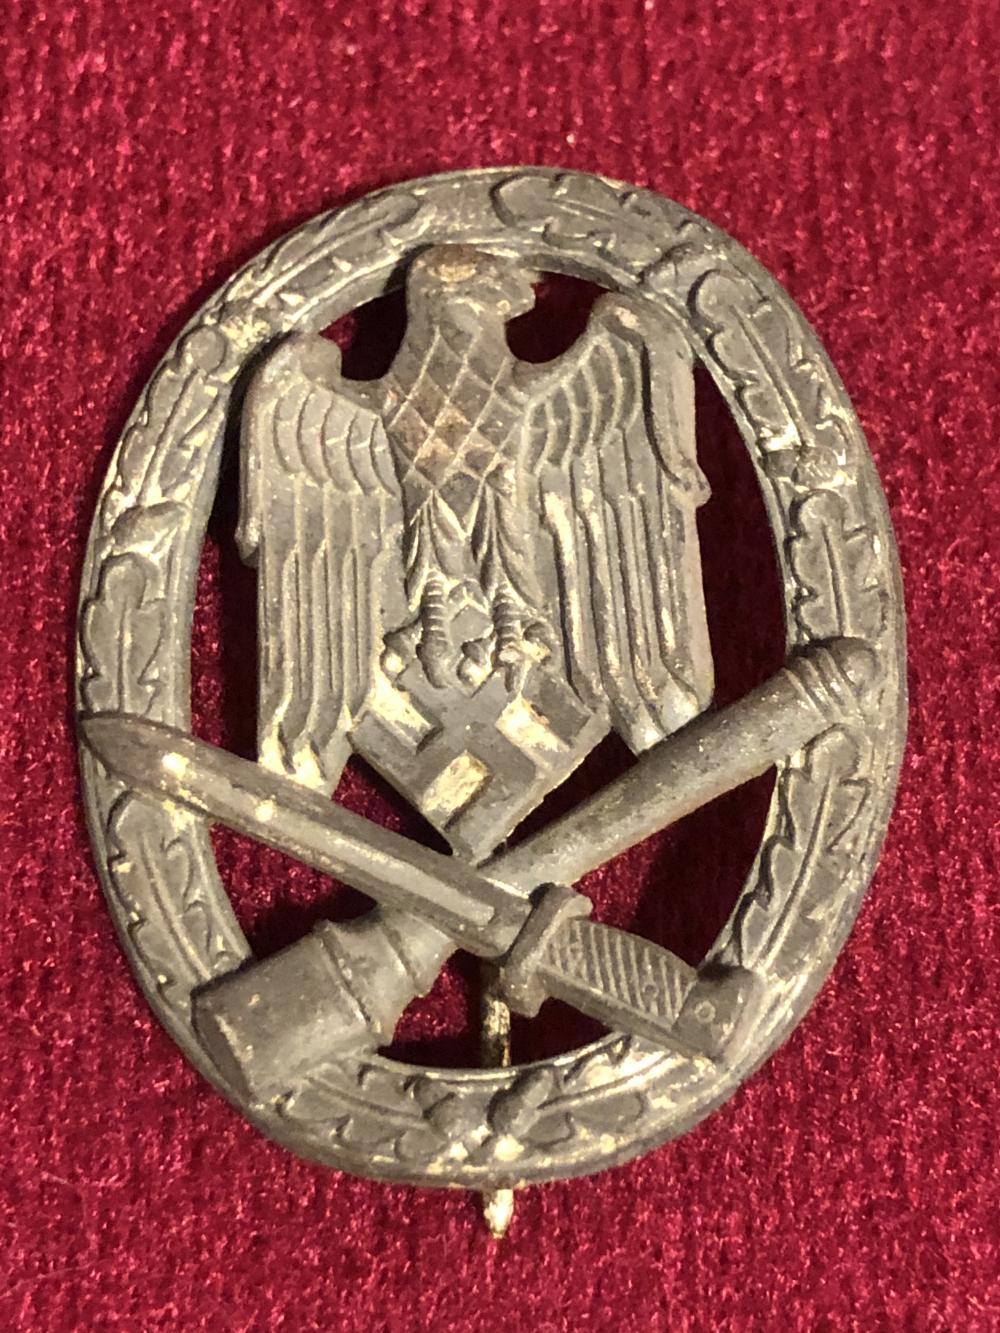 WWII German Nazi general assault badge